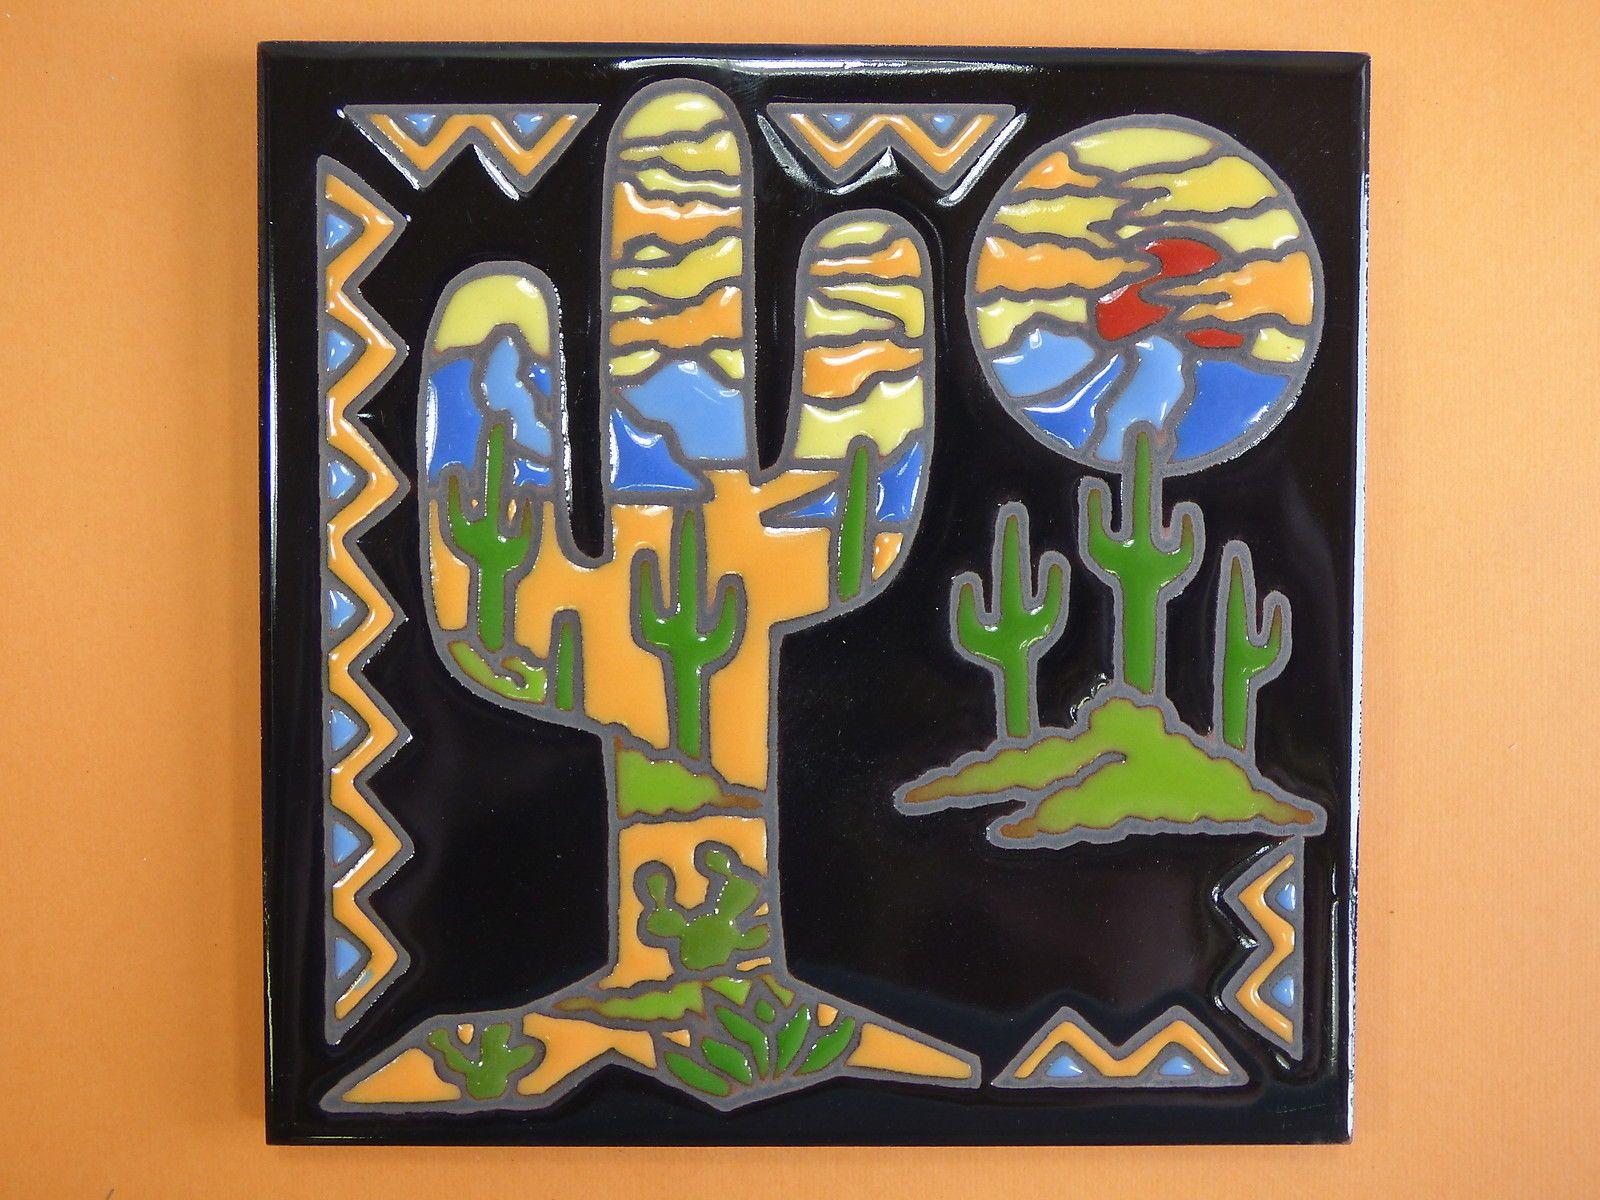 Ceramic Art Tile 6x6 Southwest Saguaro Cactus Vibrant Colors Trivet Wall New I31 Ebay Tile Art Ceramic Art Art